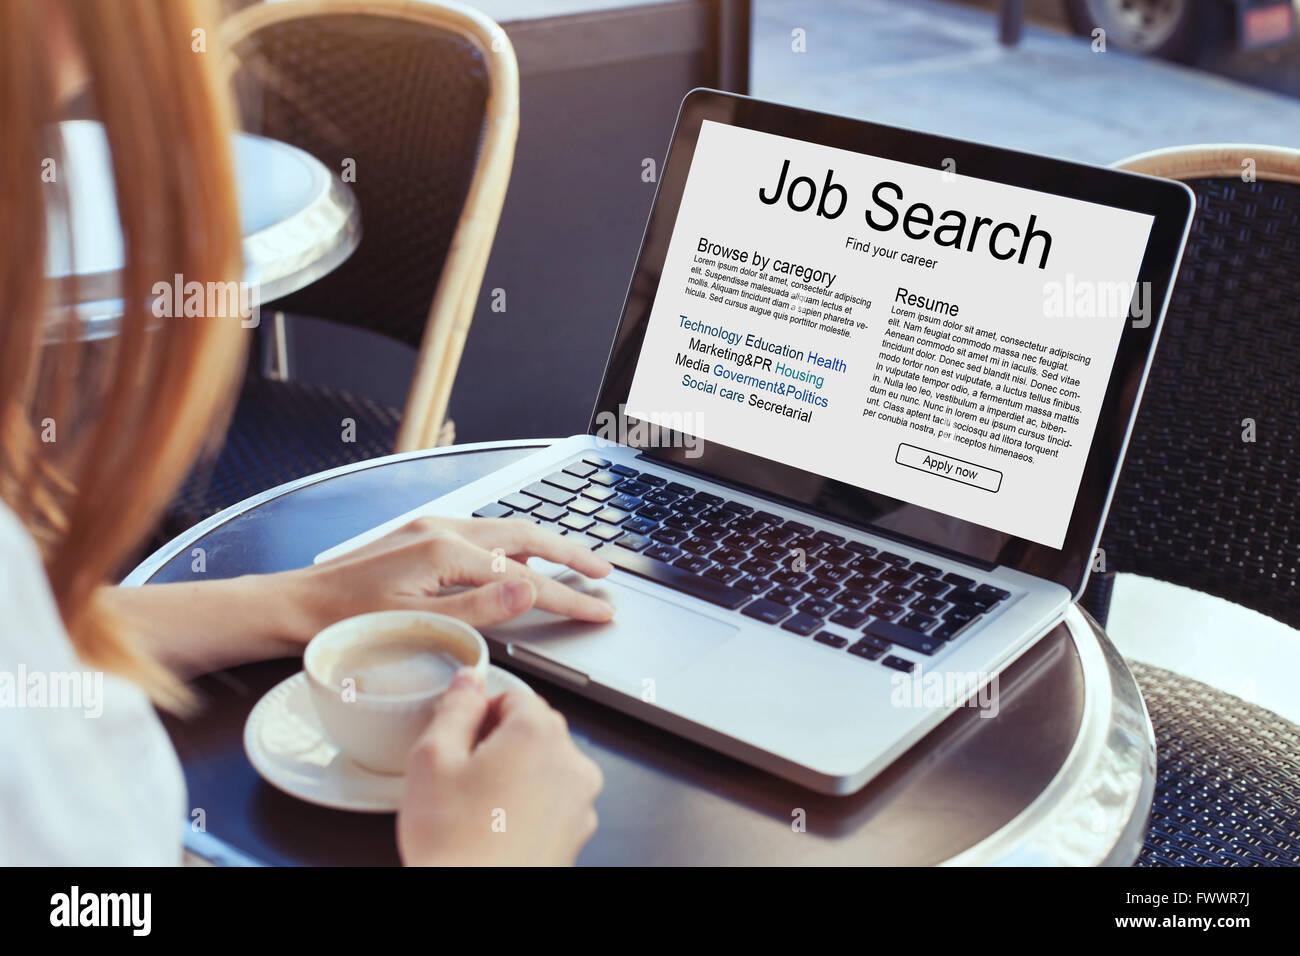 Concepto de búsqueda de empleo, encontrar tu carrera online website Imagen De Stock